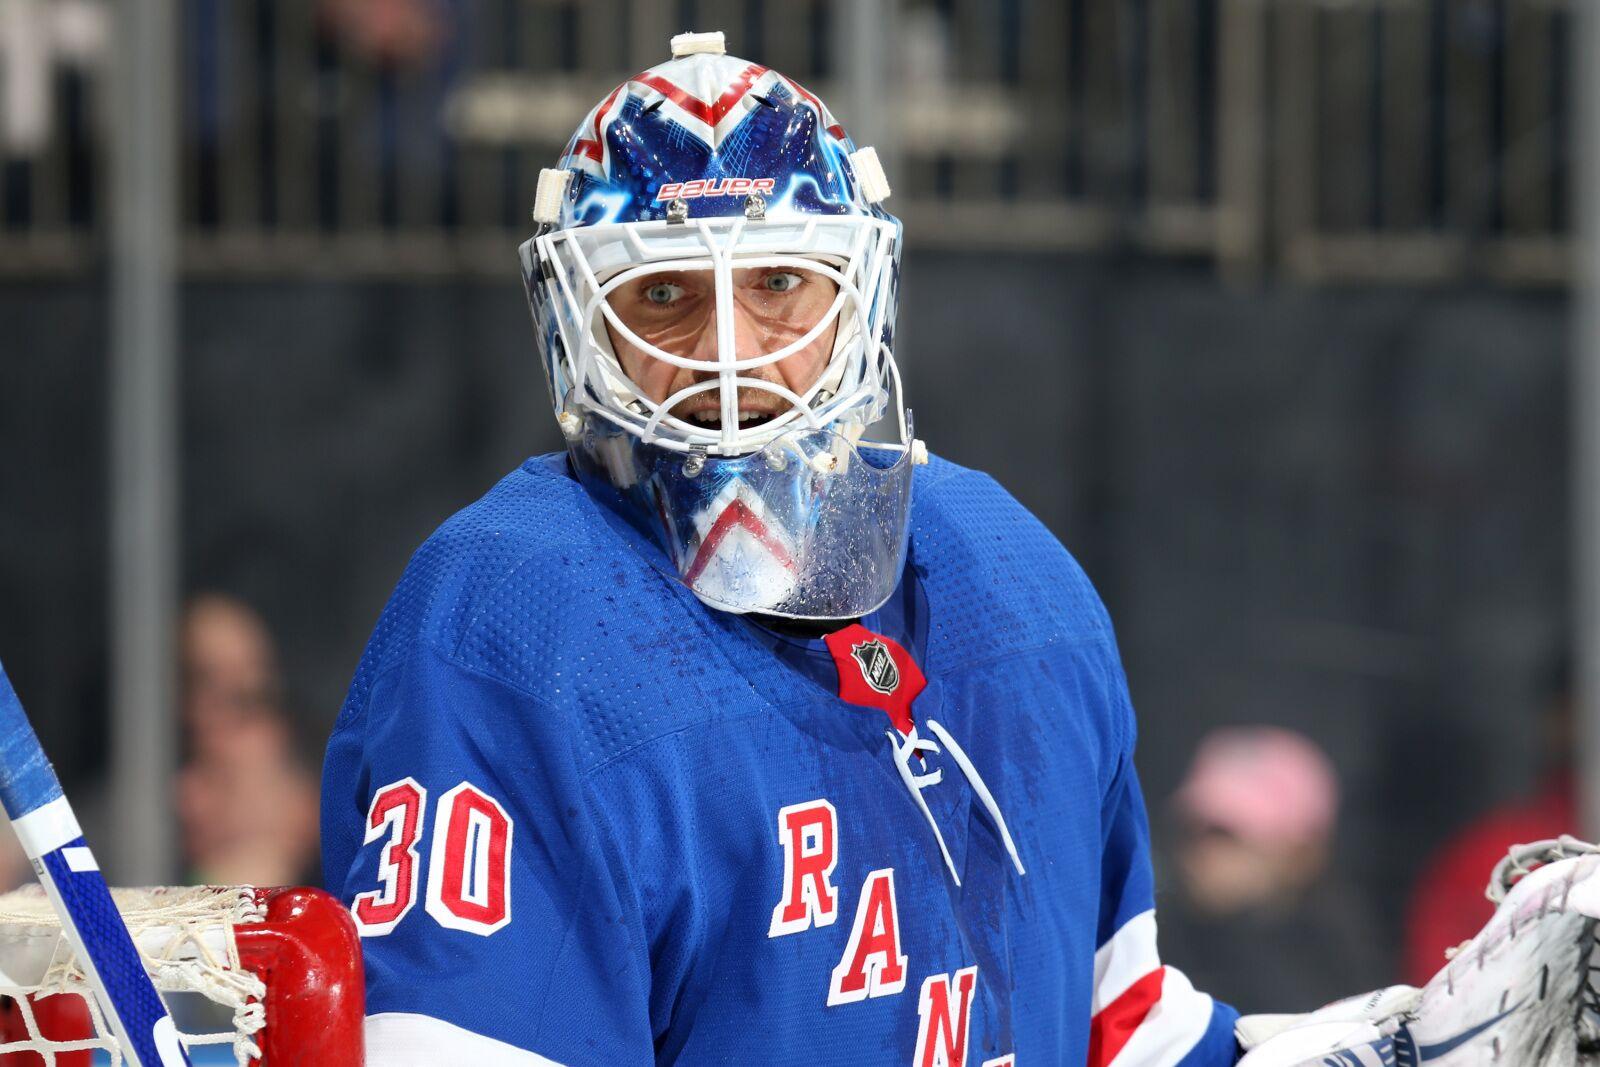 New York Rangers Will Henrik Lundqvist Reach 450 Wins This Season